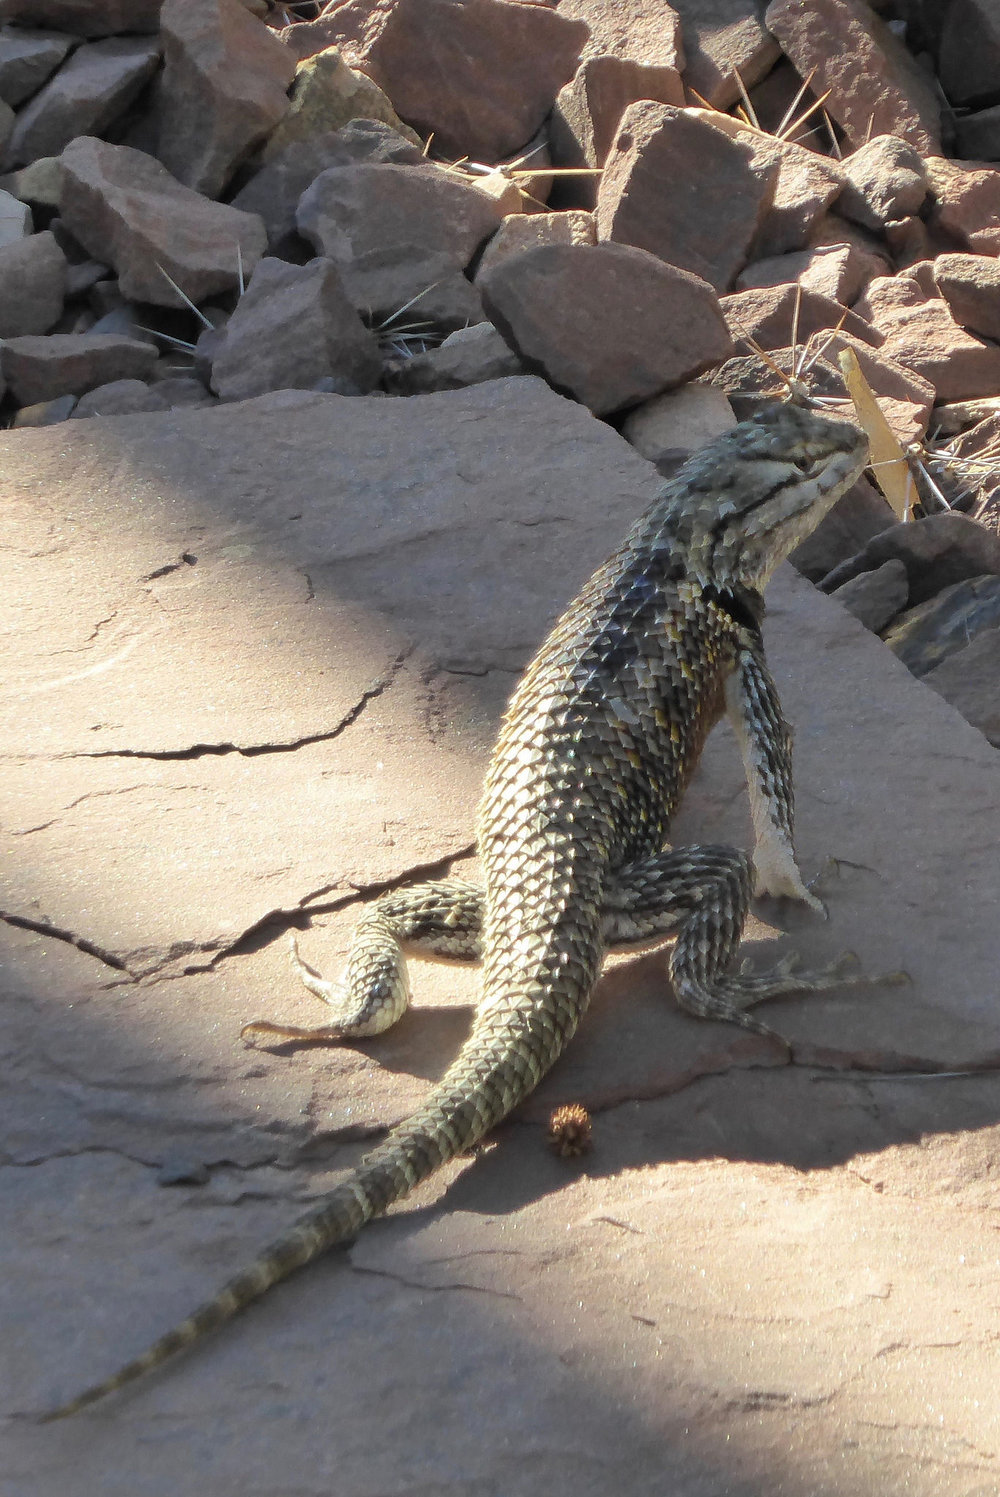 Deset spiny lizard posing